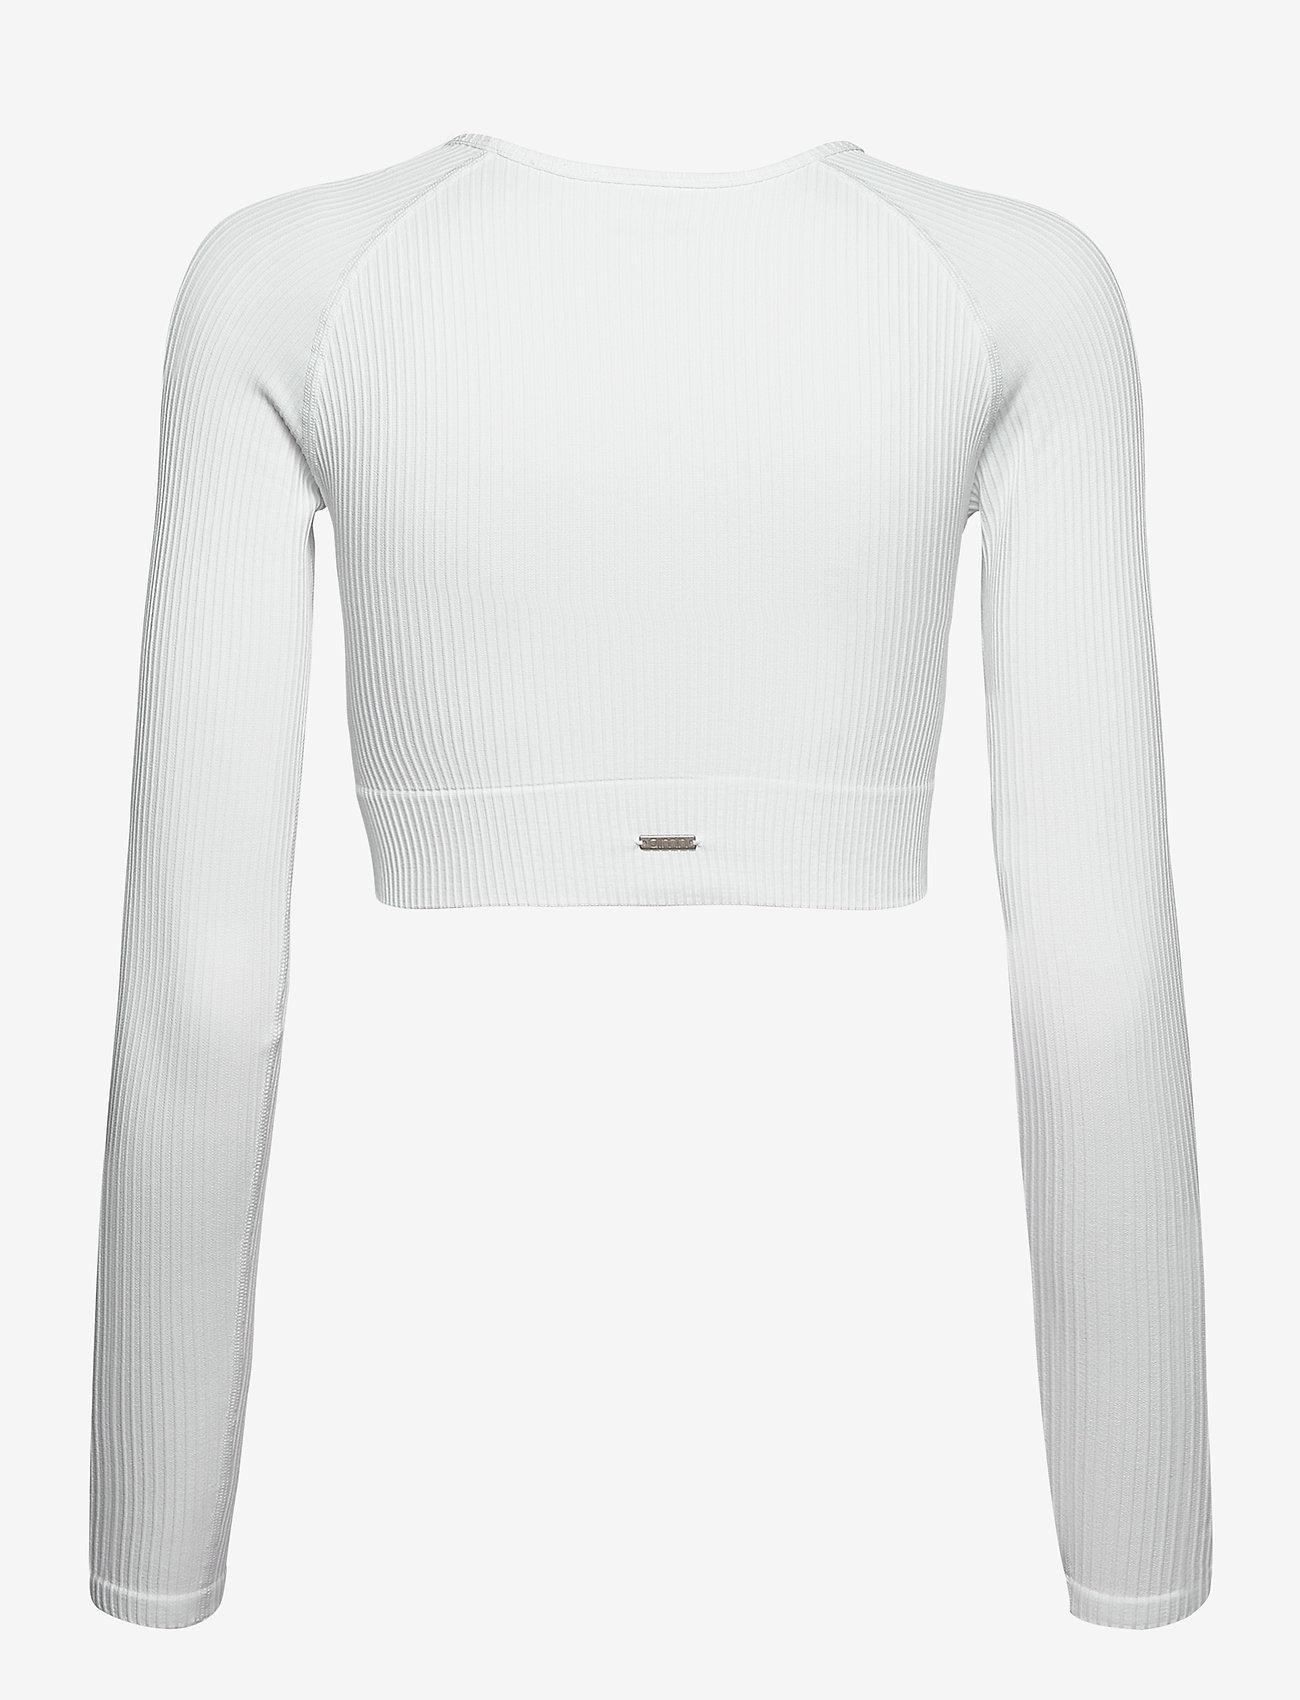 AIM'N - White Ribbed Seamless Crop Long Sleeve - langærmede toppe - white - 1